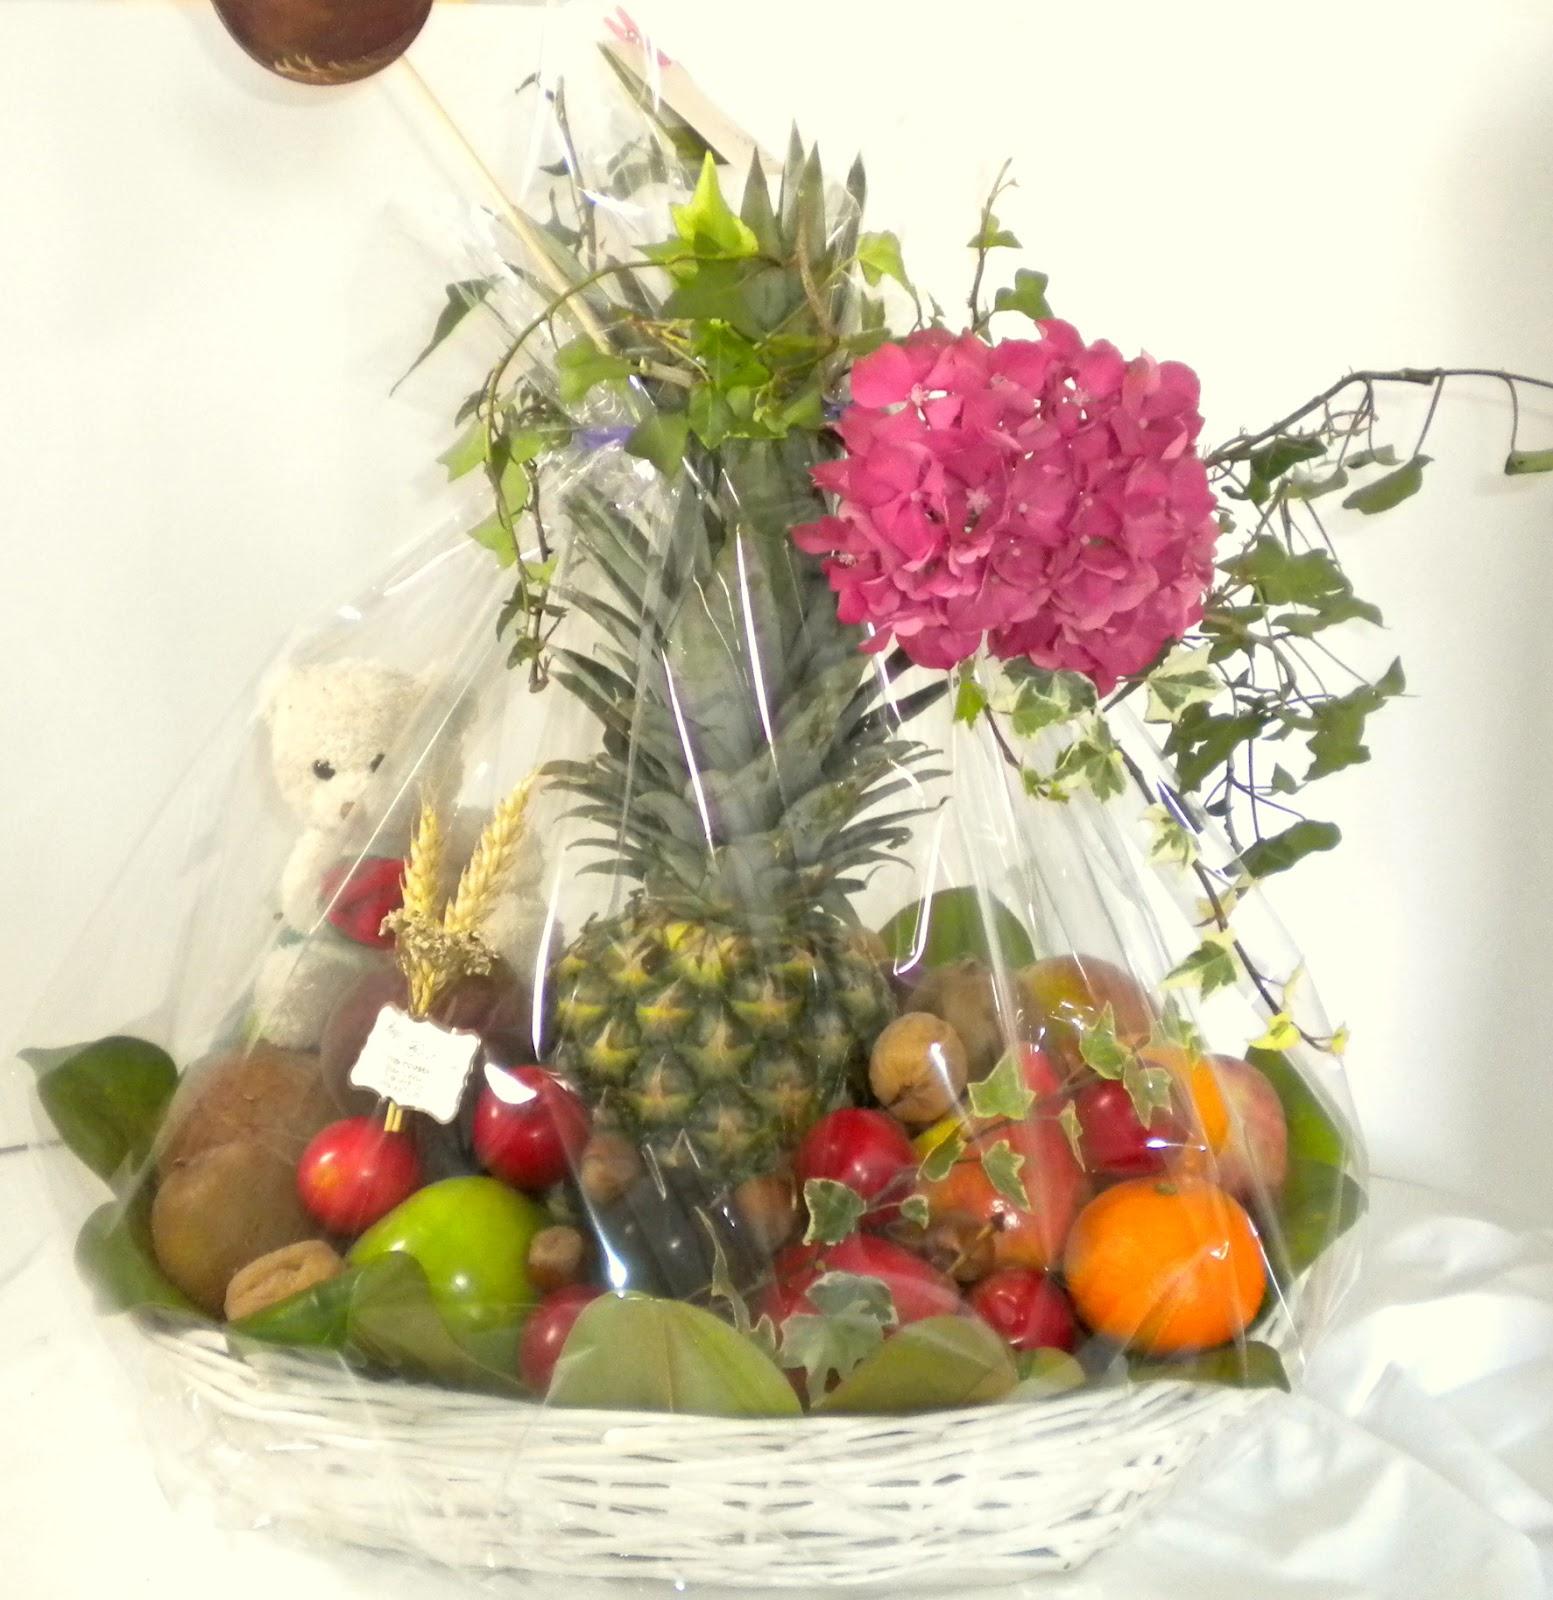 Regalo en centros de fruta for Centros de frutas